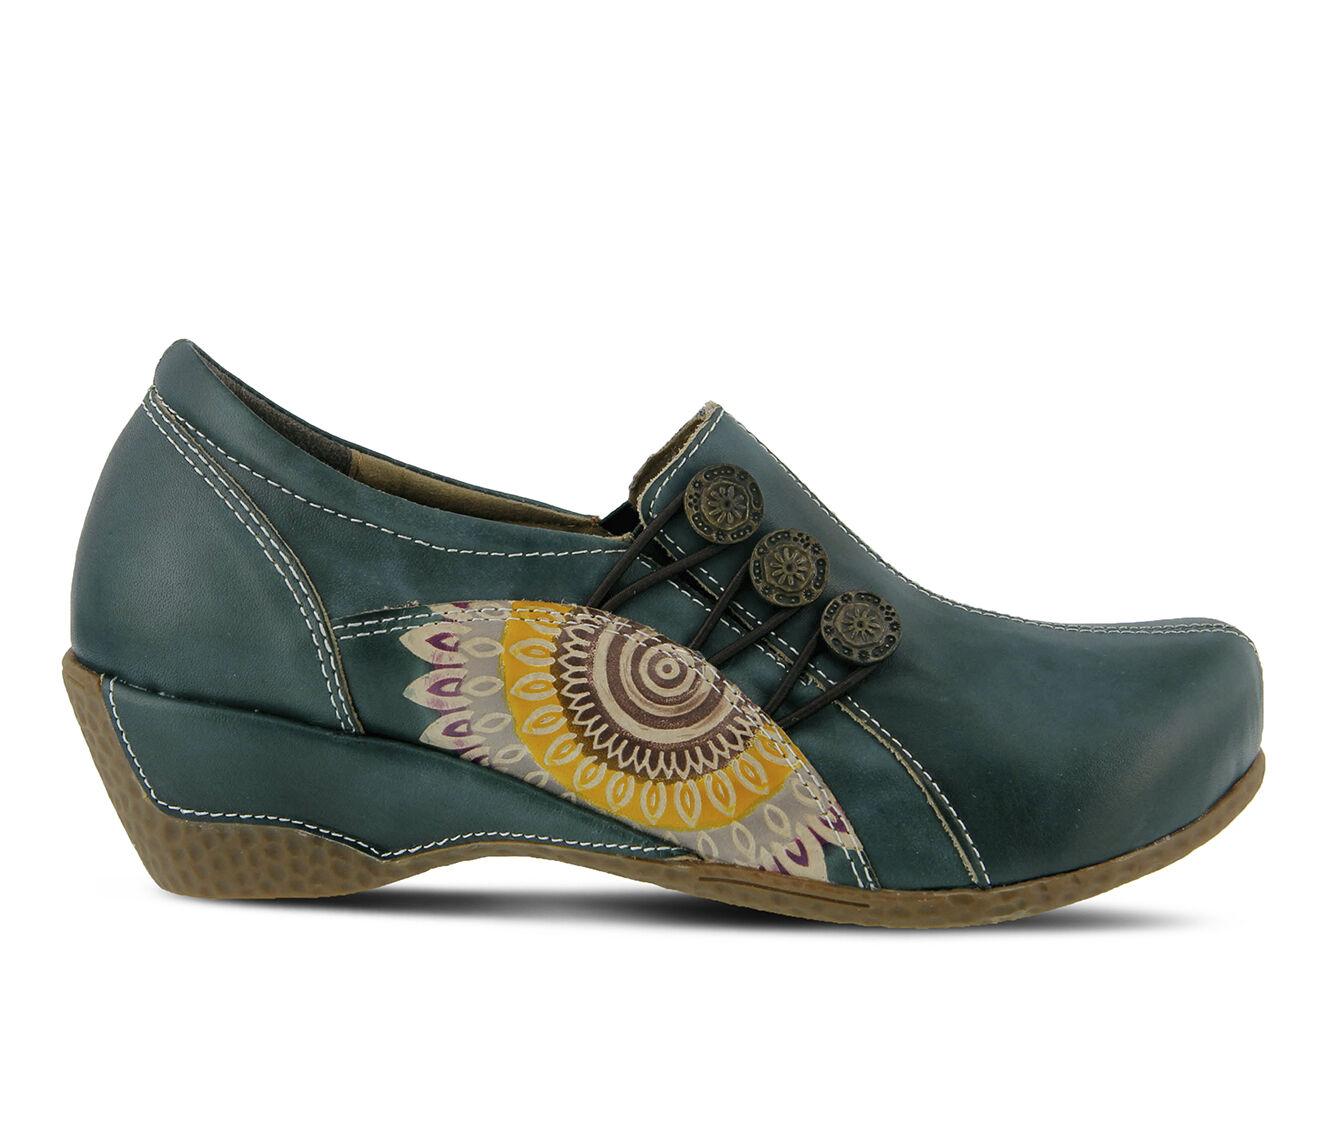 Women's L'ARTISTE Agacia Shoes Teal